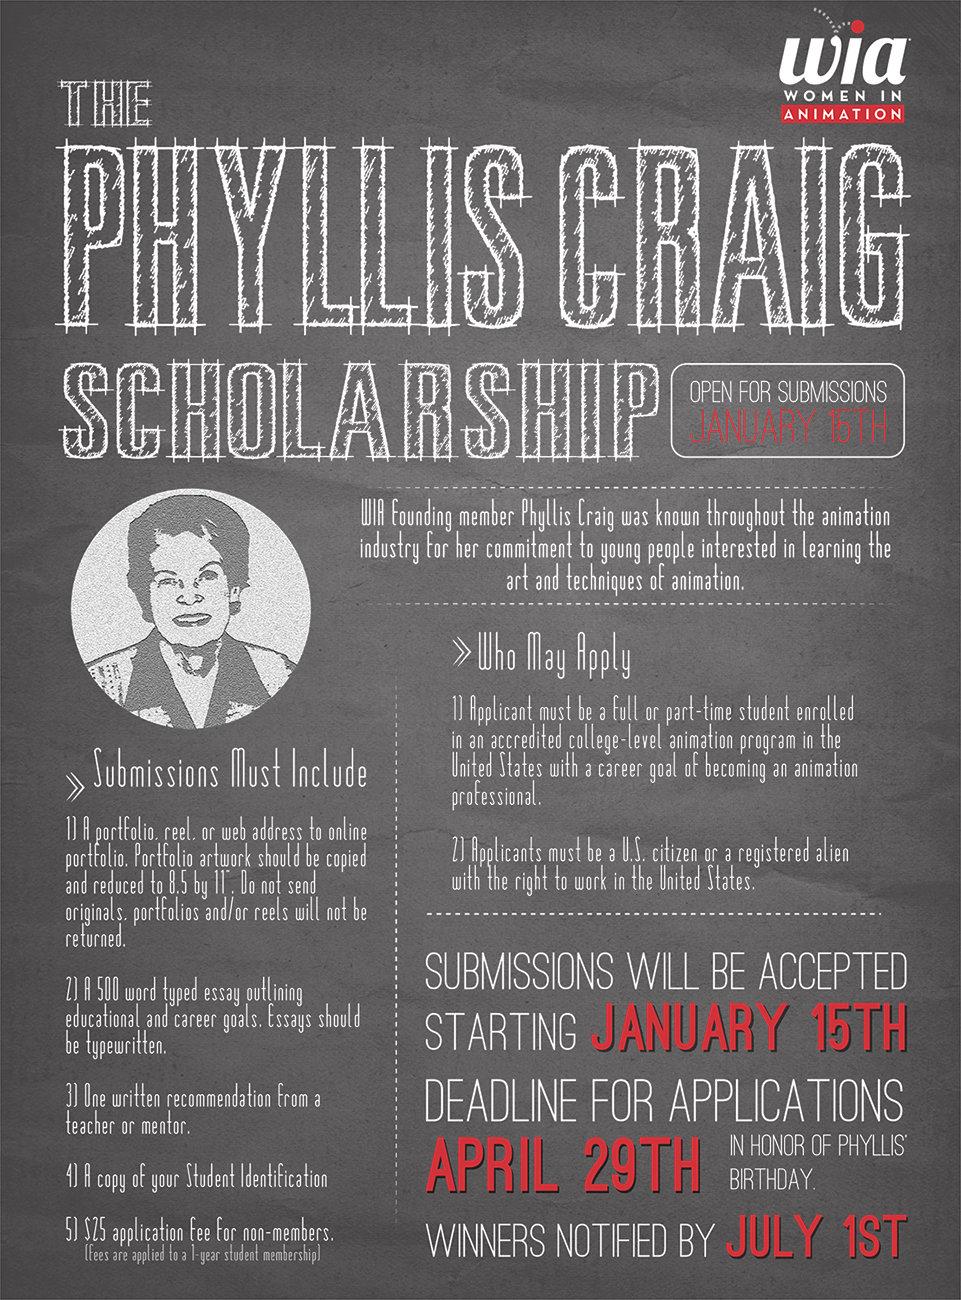 WIA Phyllis Craig Scholarship